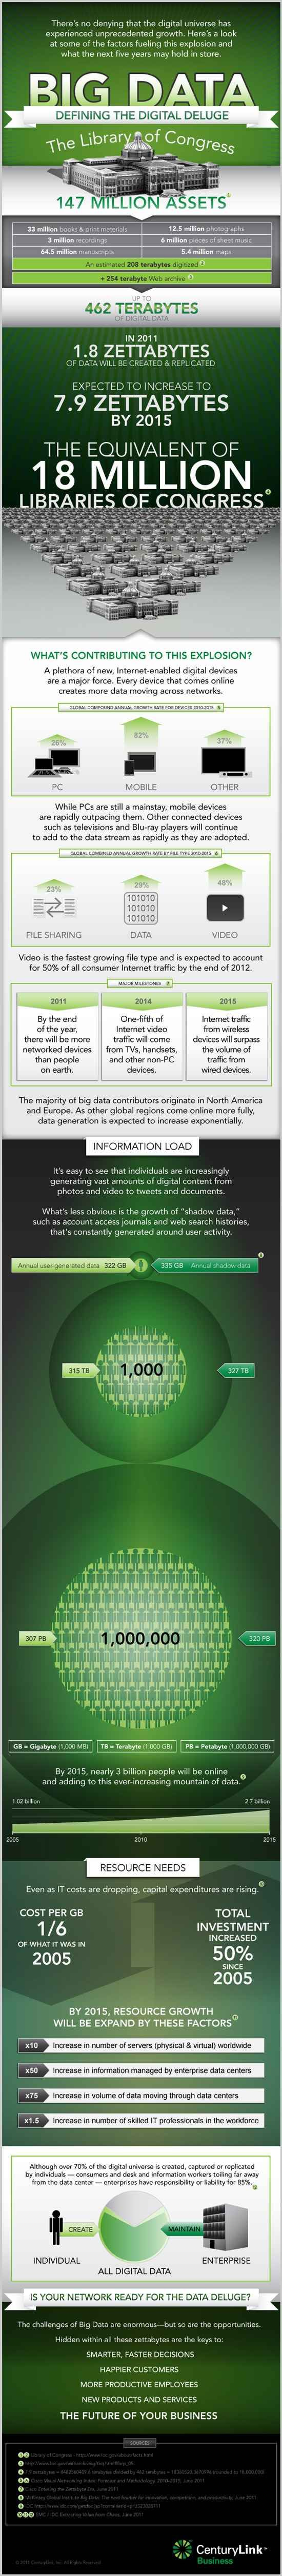 Big Data Infographic and Gartner 2012 Top 10 Strategic Tech Trends